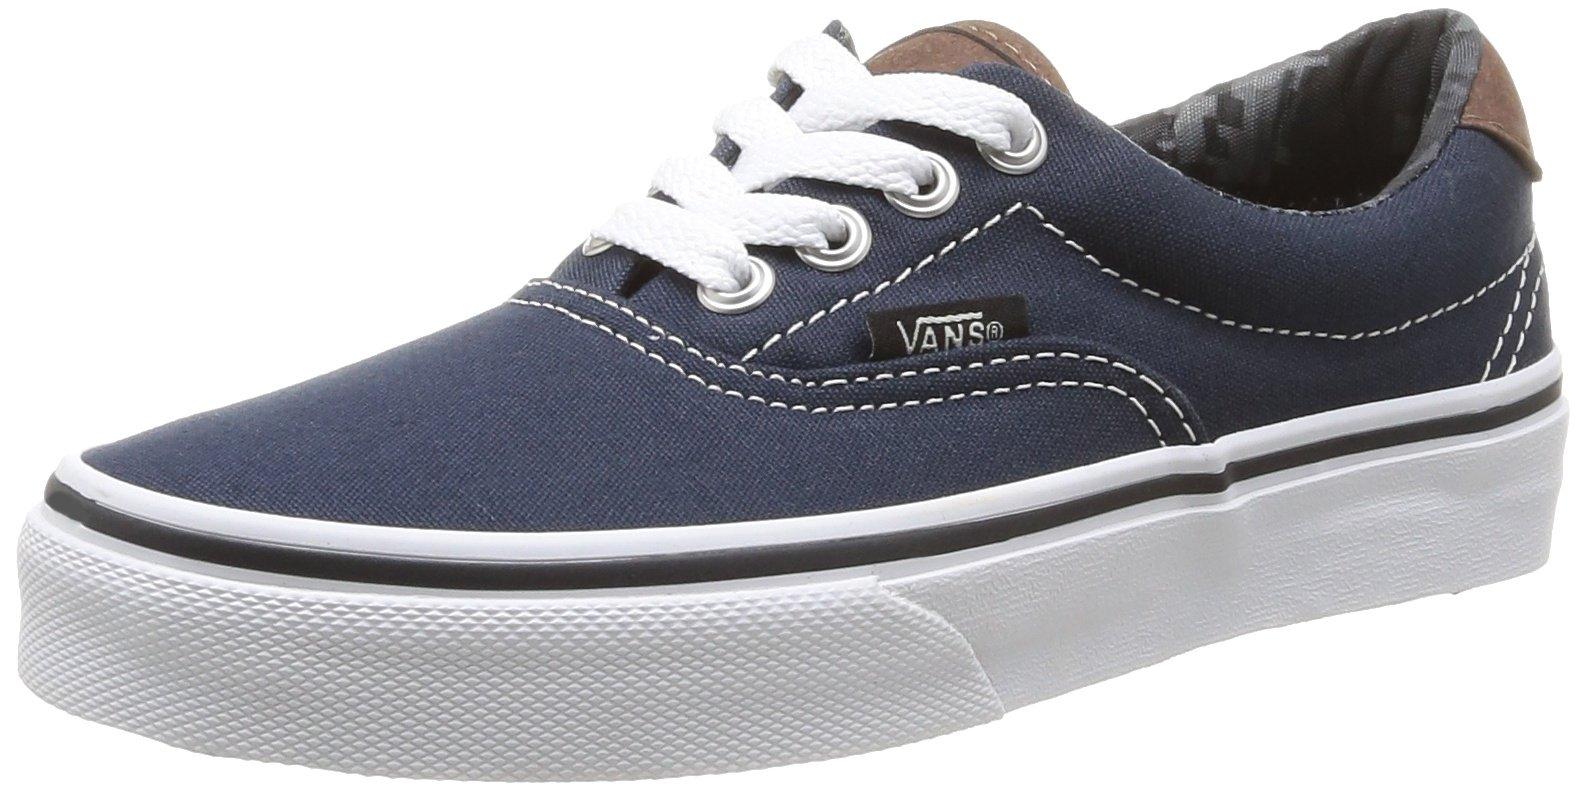 Vans Era 59 Youth US 11 Blue Skate Shoe